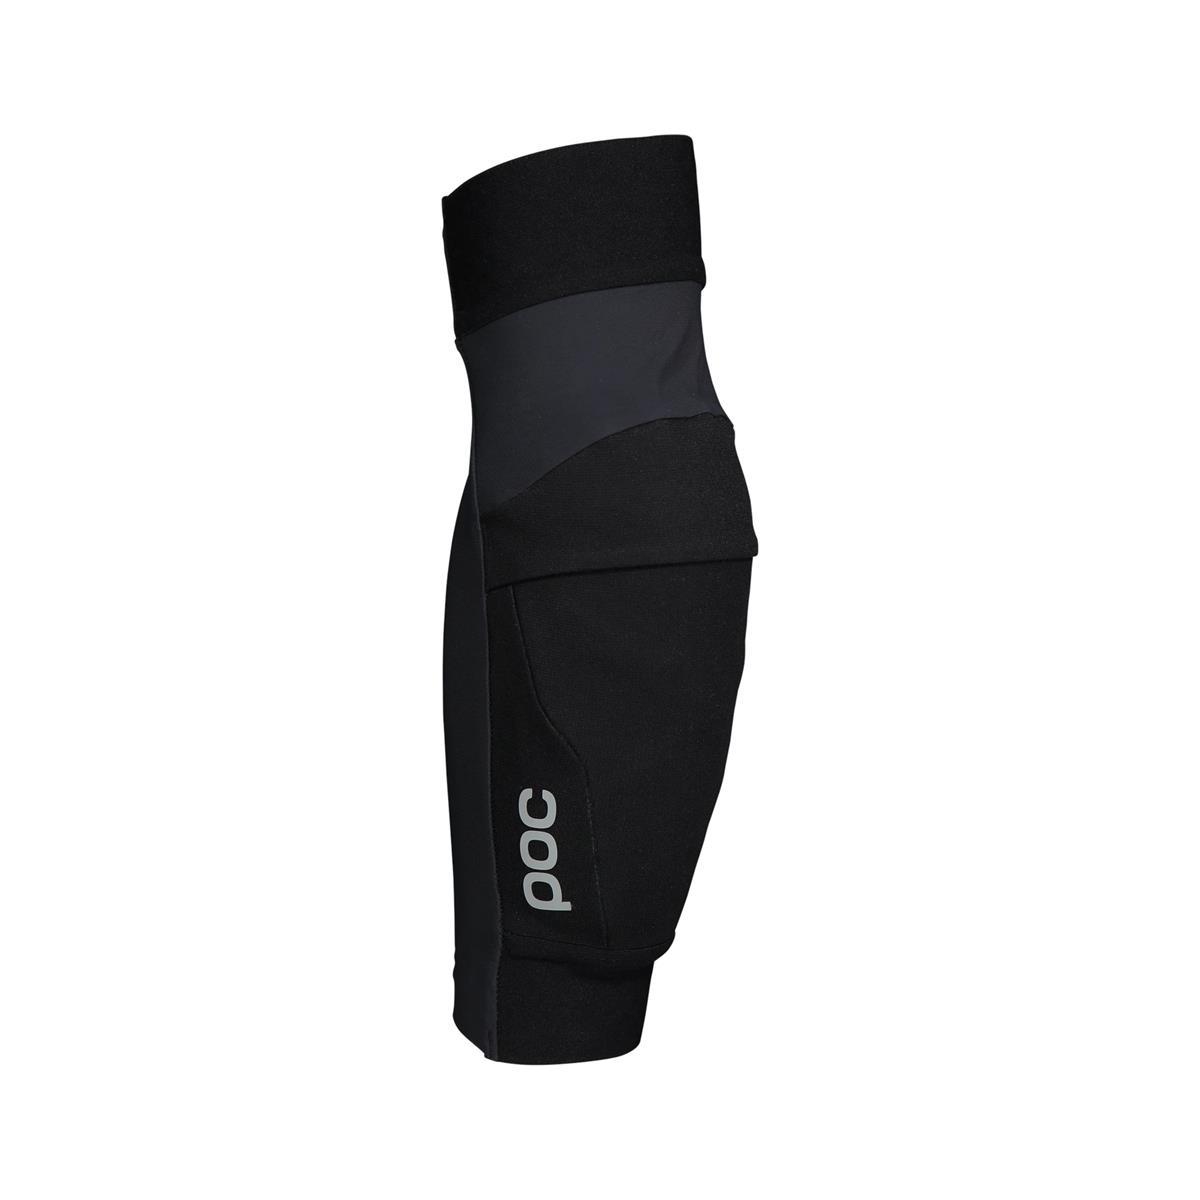 Oseus VPD Elbow Protectors Uranium Black Size S